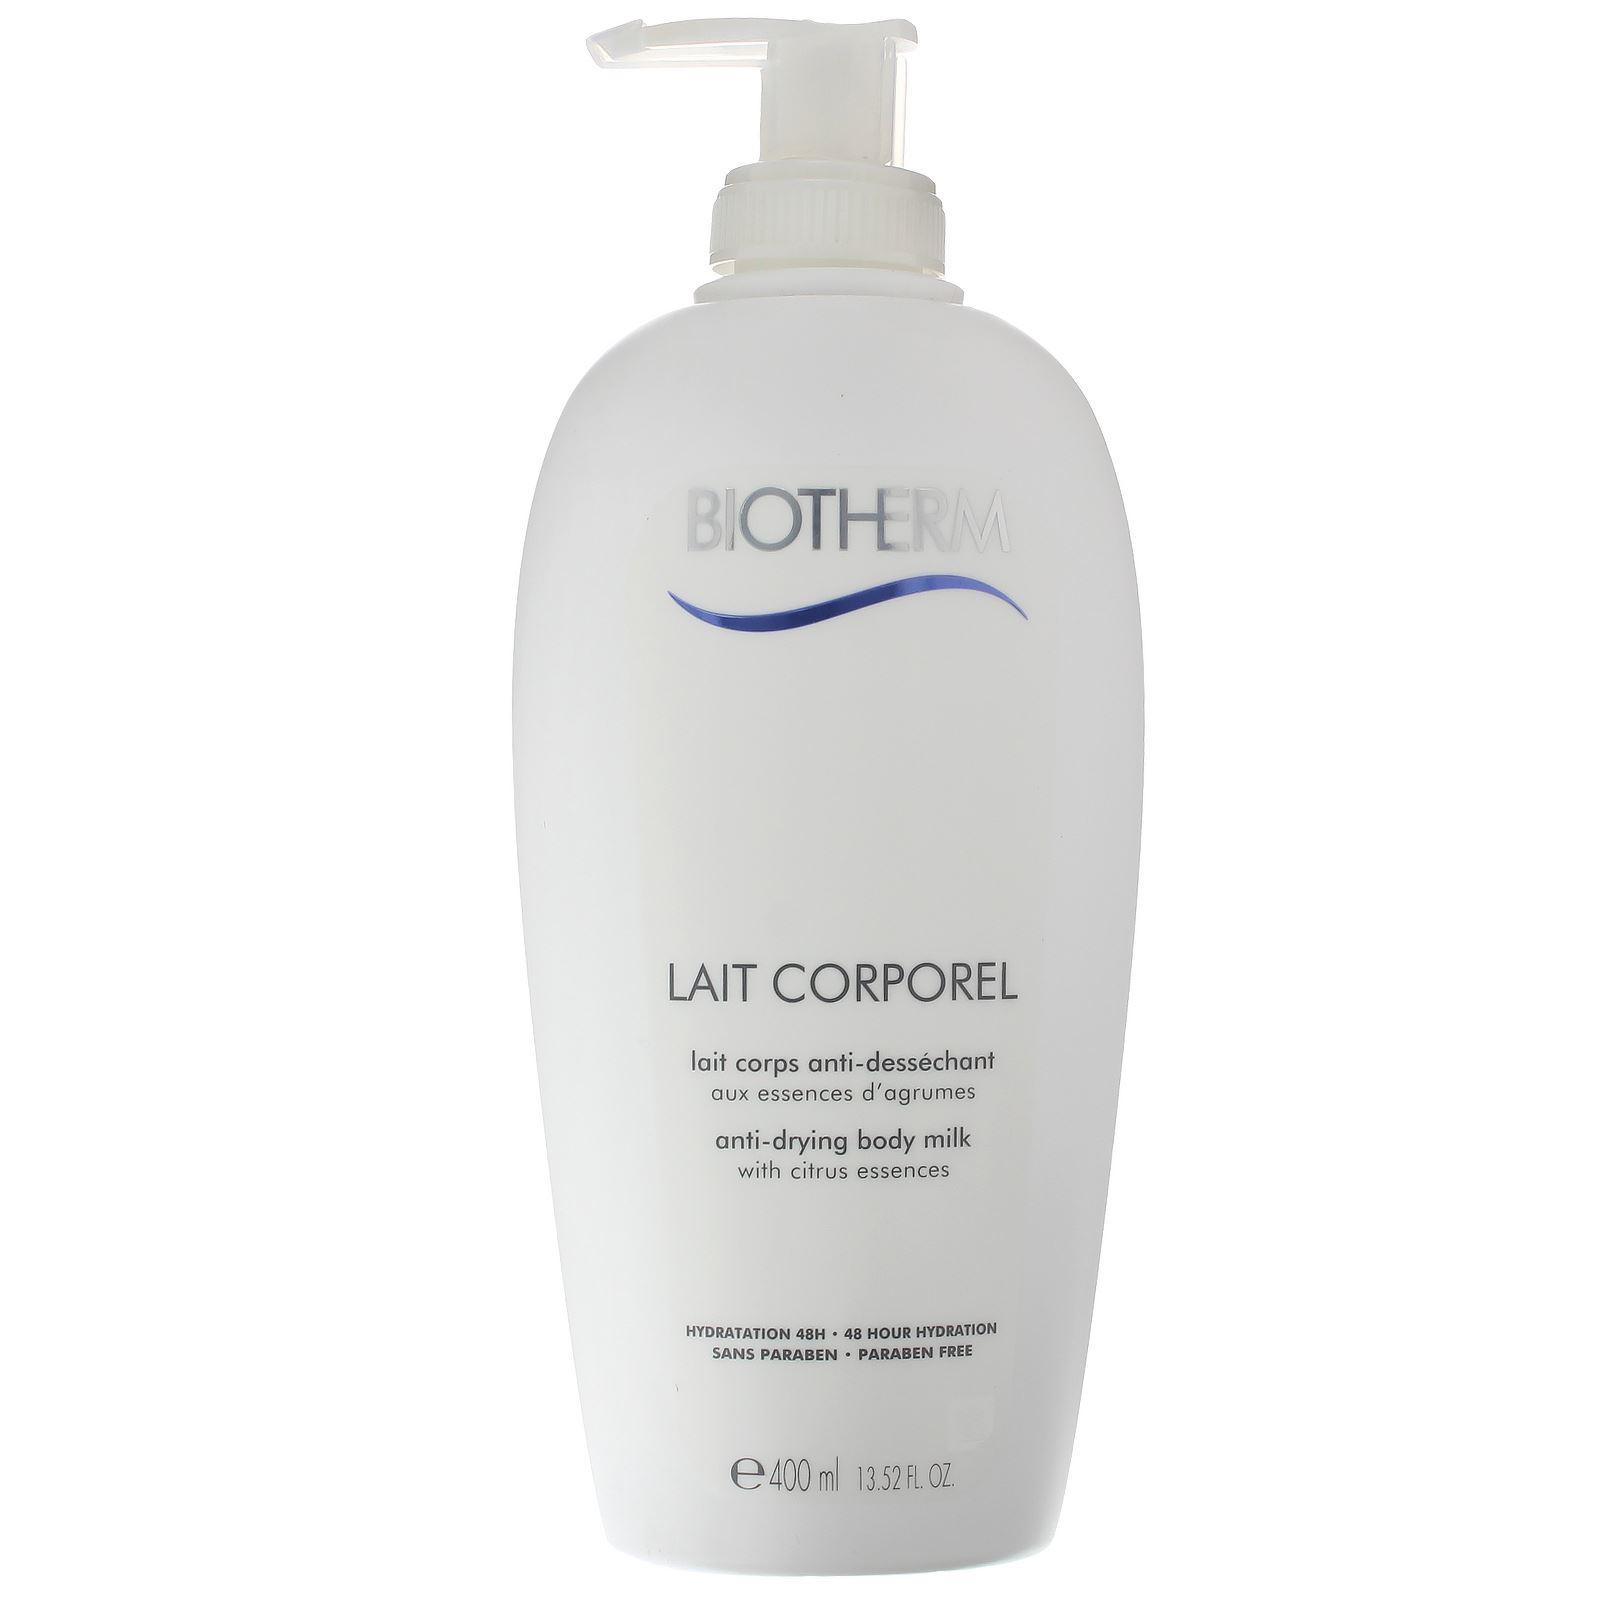 Biotherm lait corporel 400ml